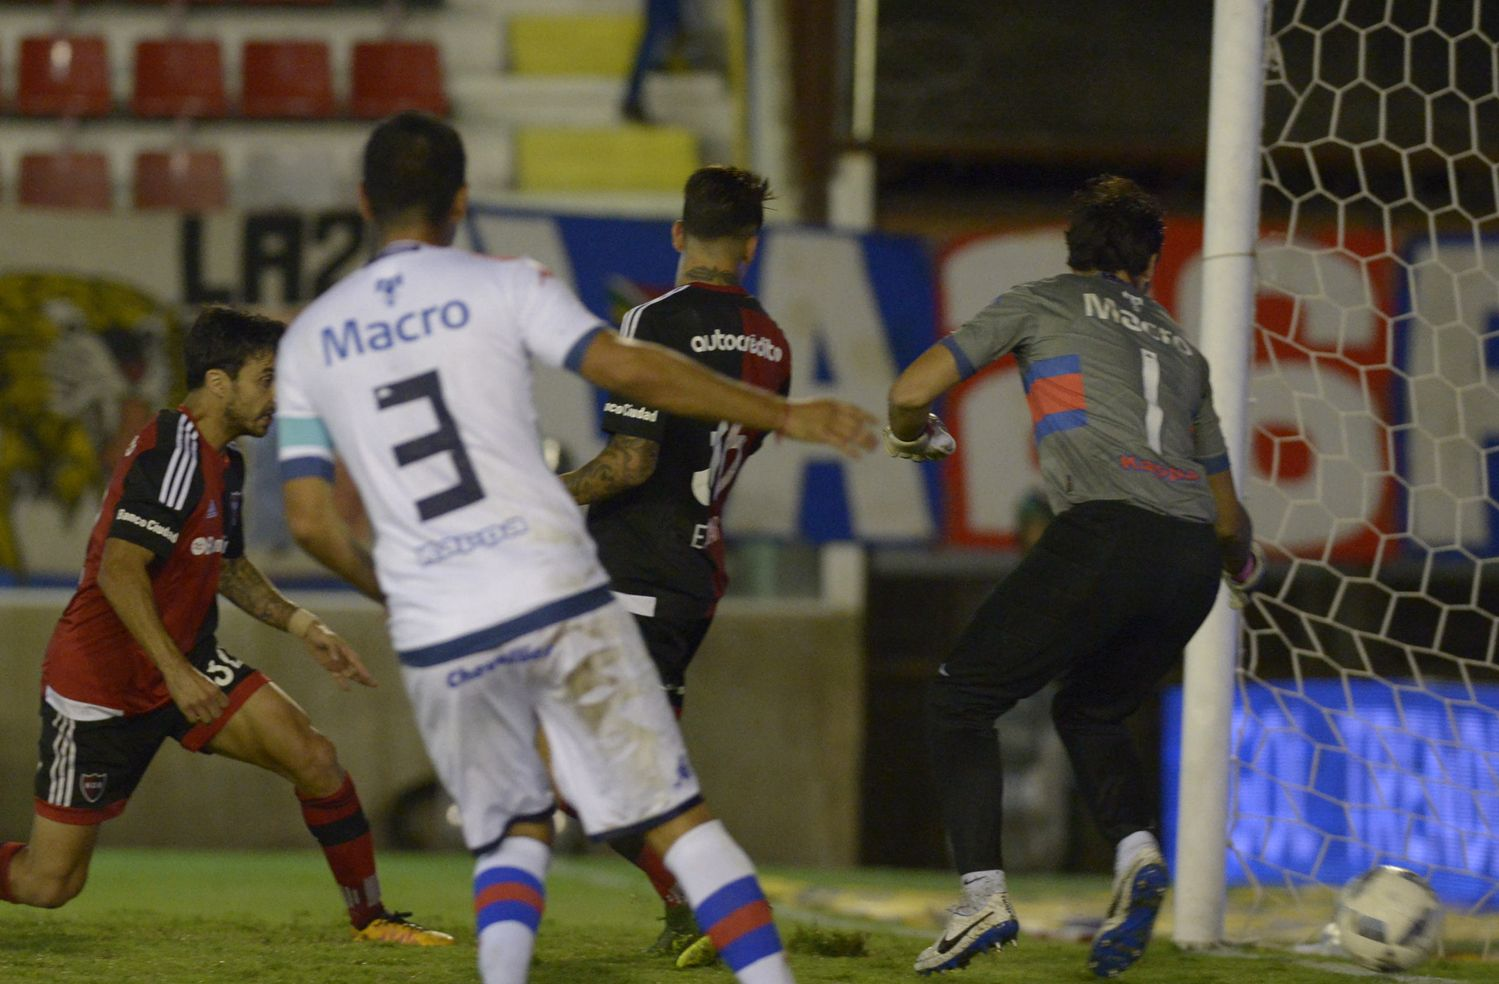 ¡Empate! Scocco ya cabeceó hacia la red. Era el impensado 3 a 3.  (Foto: Sebastián Suárez Meccia / La Capital)